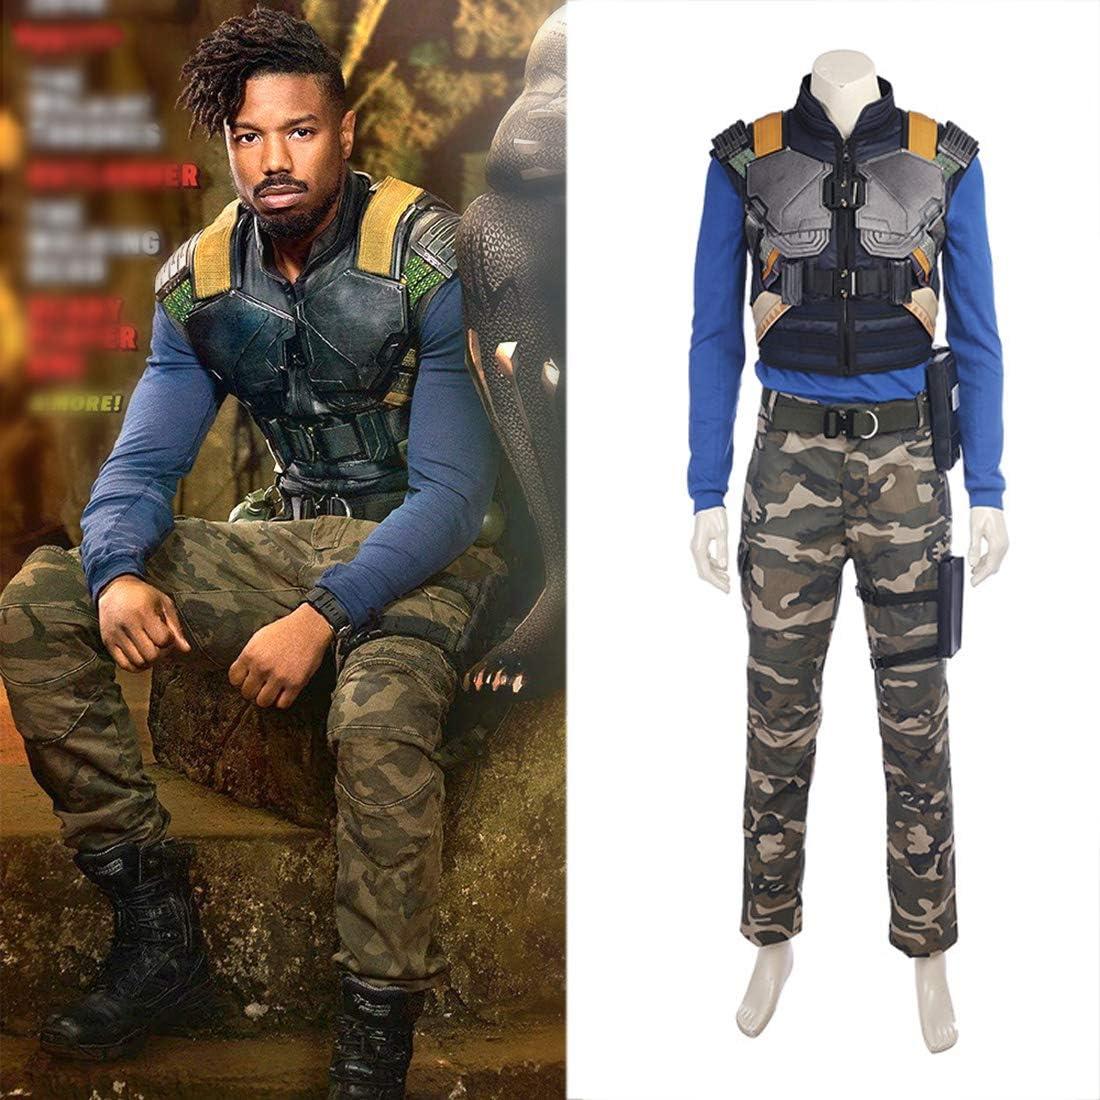 Rubyonly New Movie Black Panther Costume Erik Killmonger Cosplay Costume Halloween Costumes For Men Full Set Whole Set Xxl Amazon Co Uk Kitchen Home